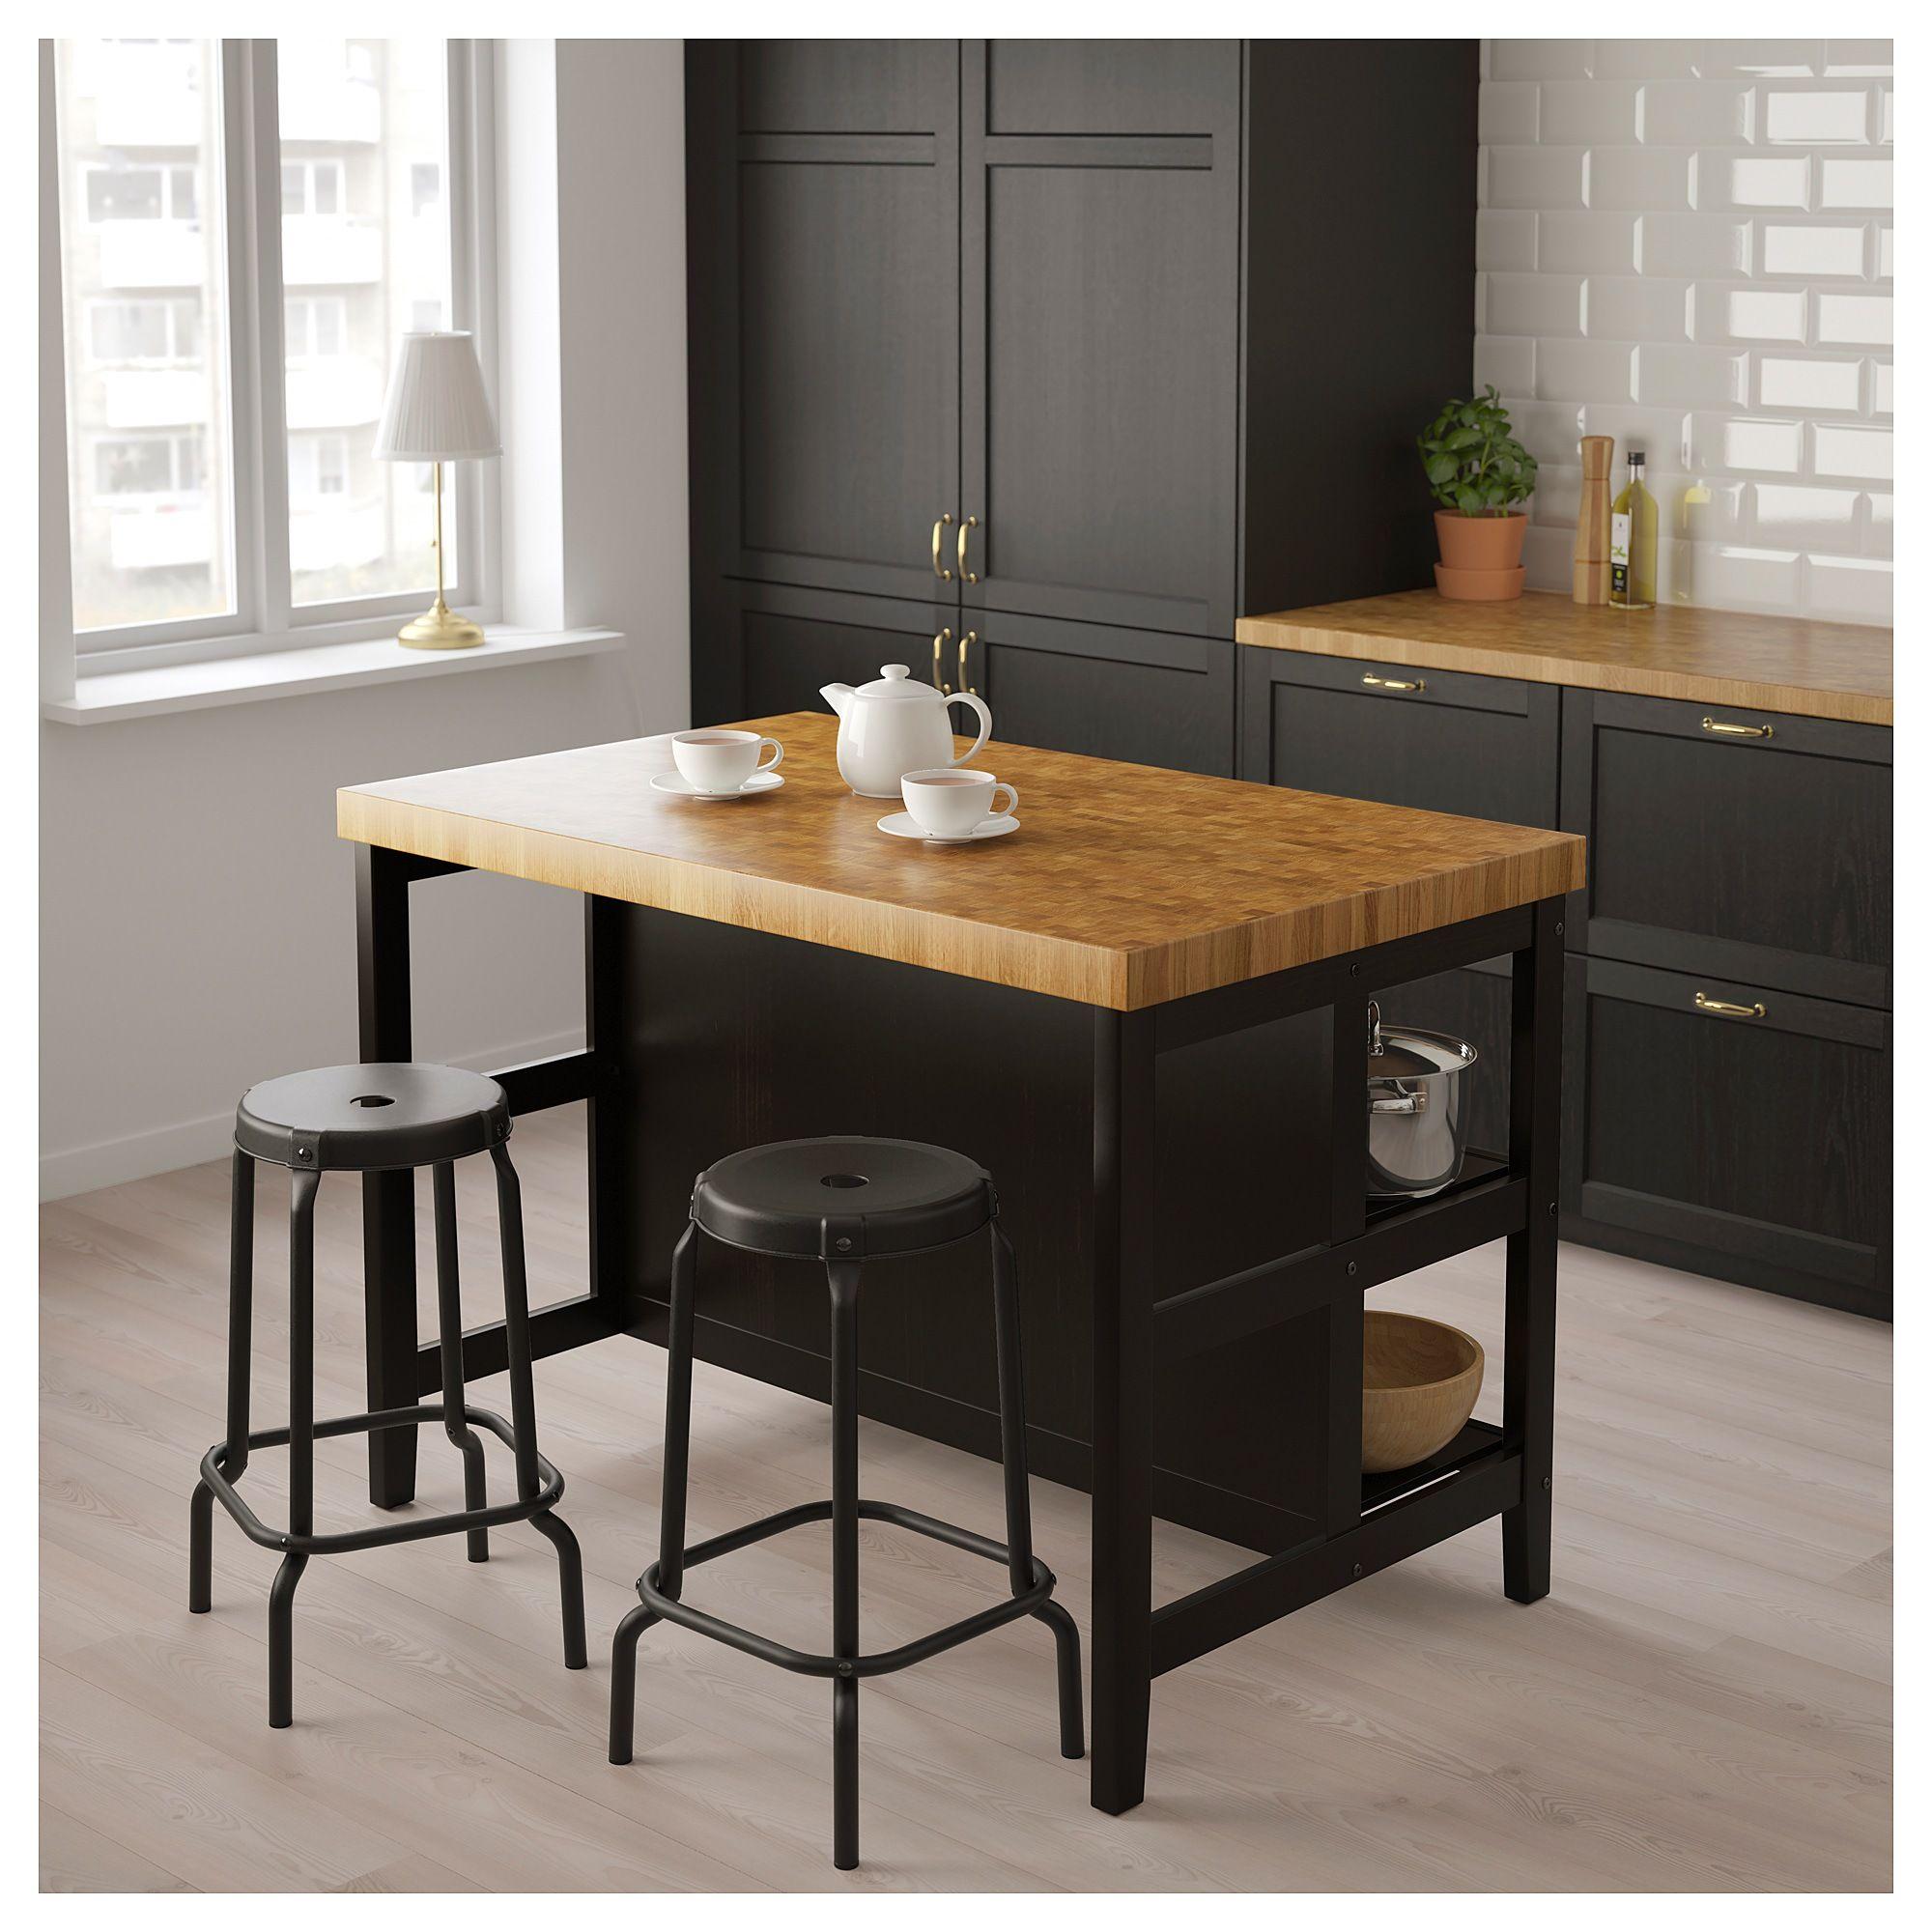 VADHOLMA Kjøkkenøy, svart, eik   Kitchen   Pinterest